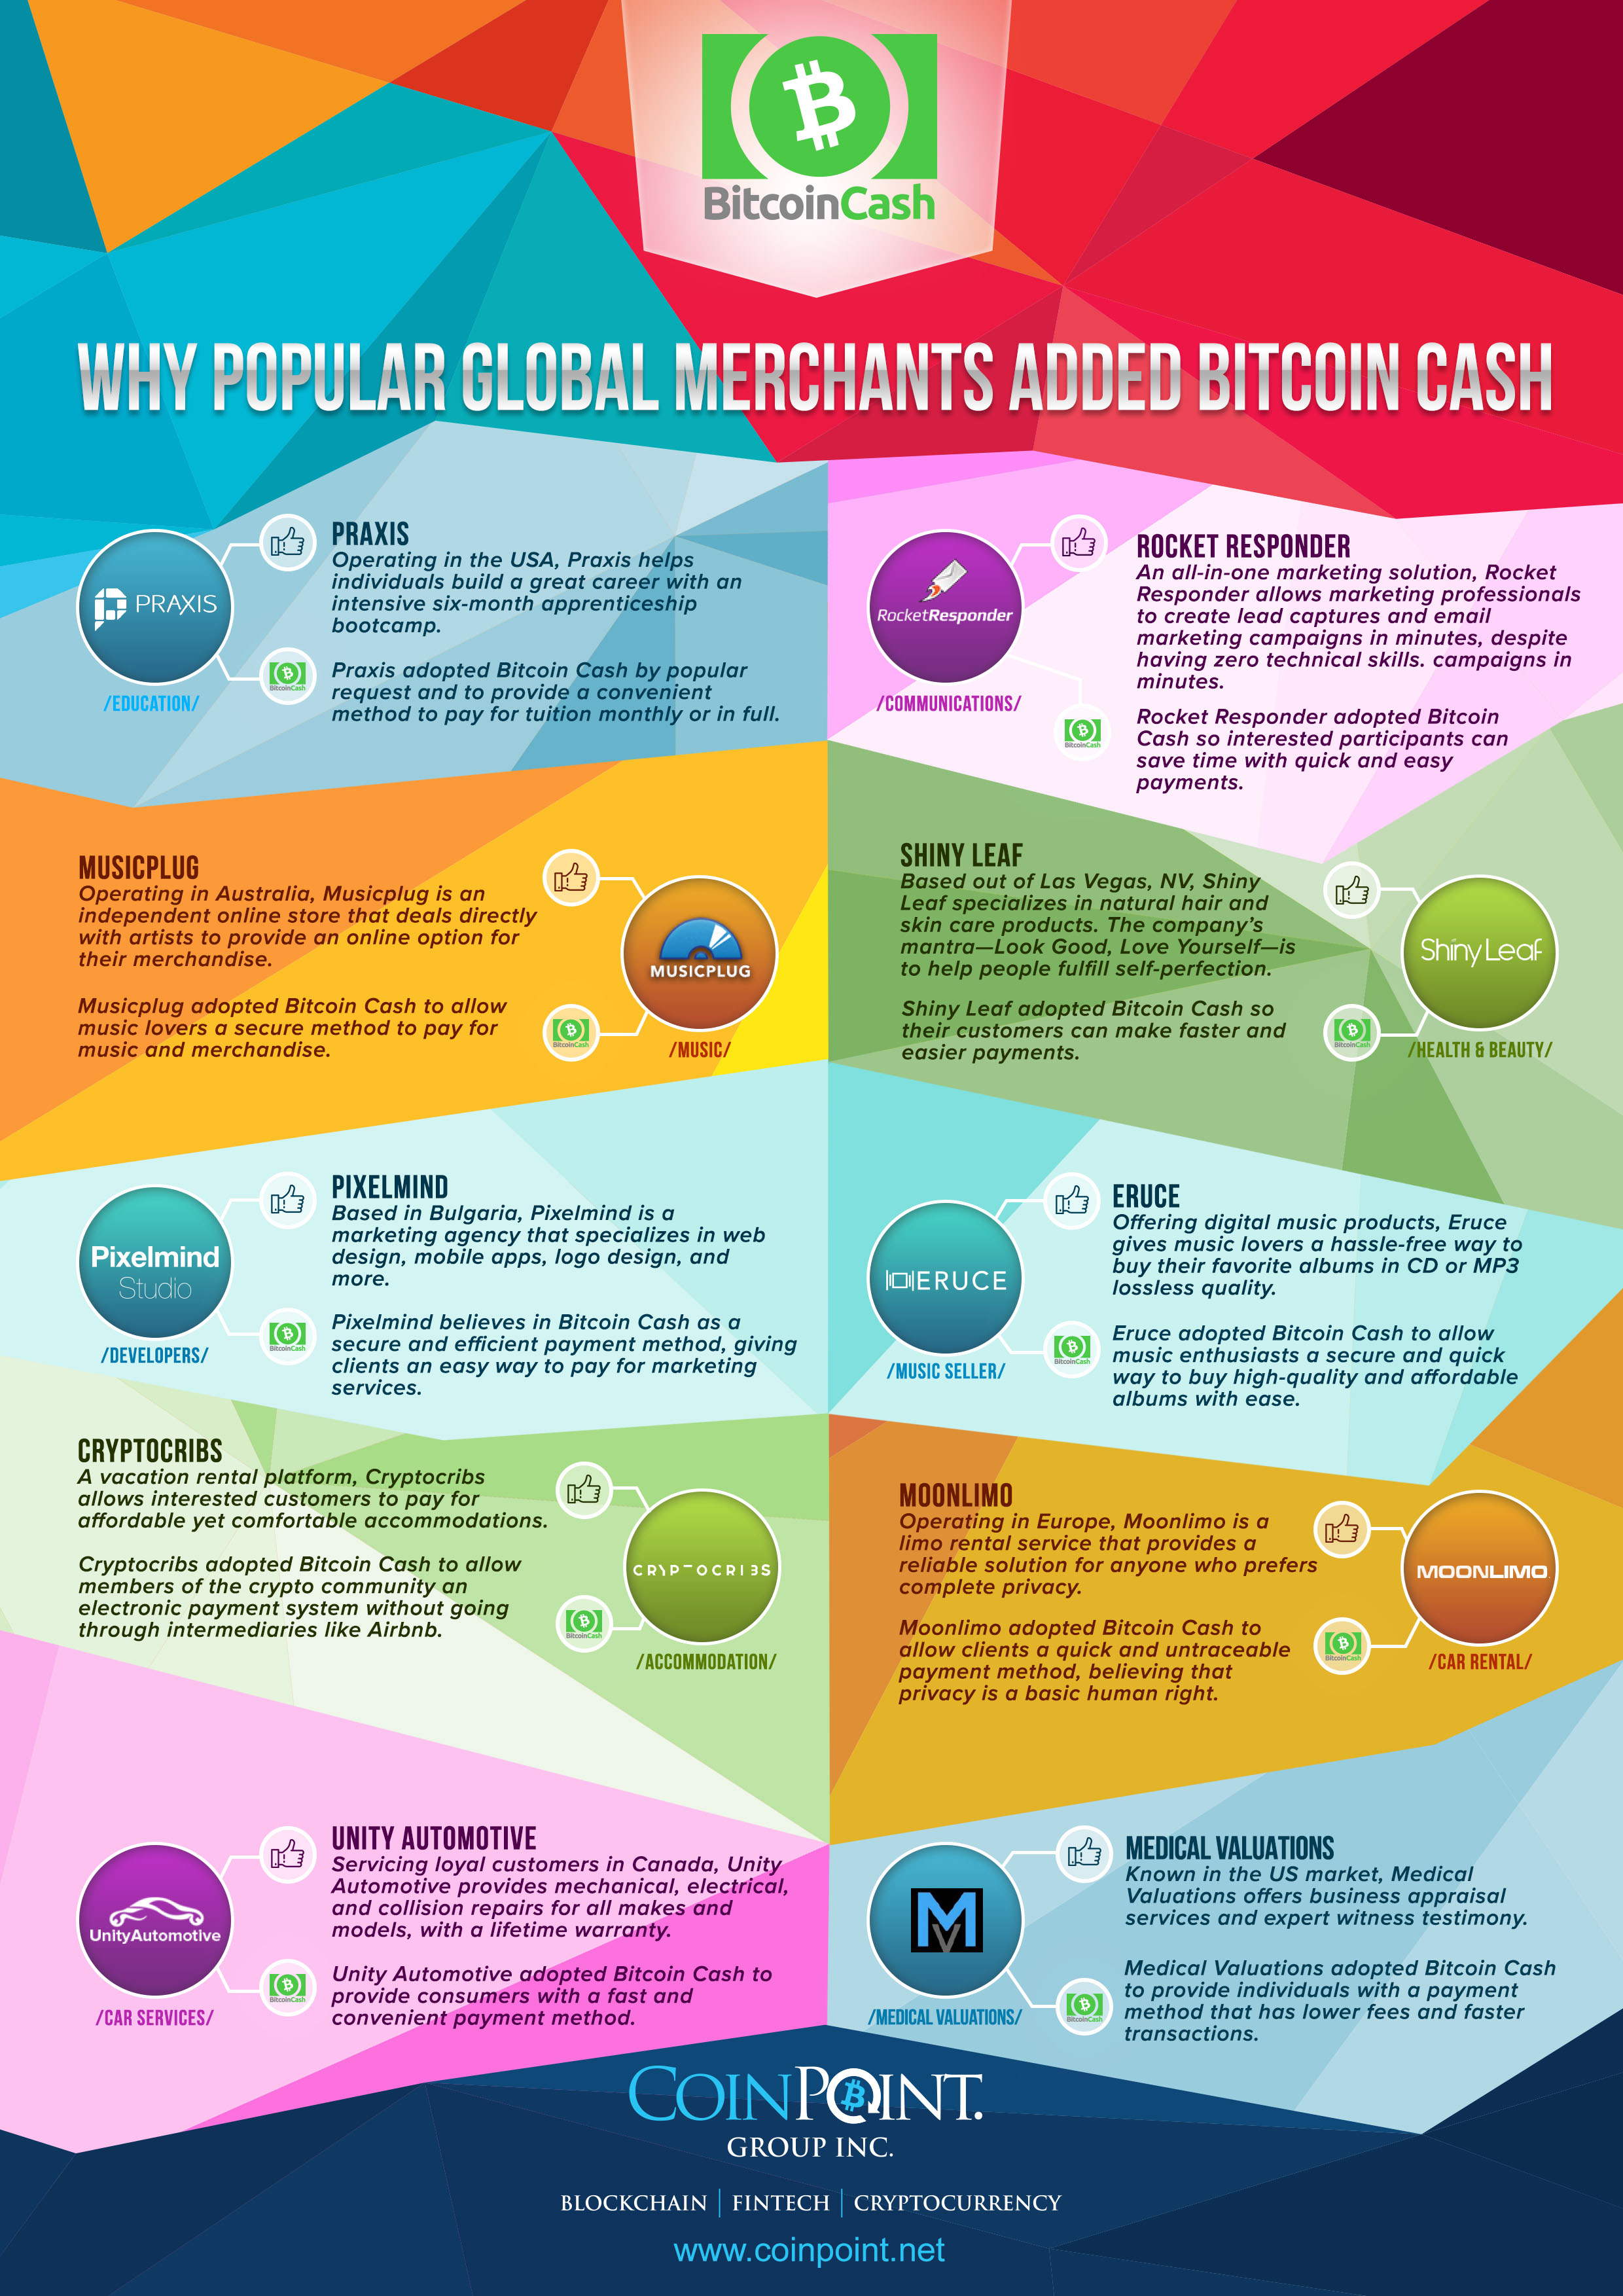 Why Popular Global Merchants Added Bitcoin Cash